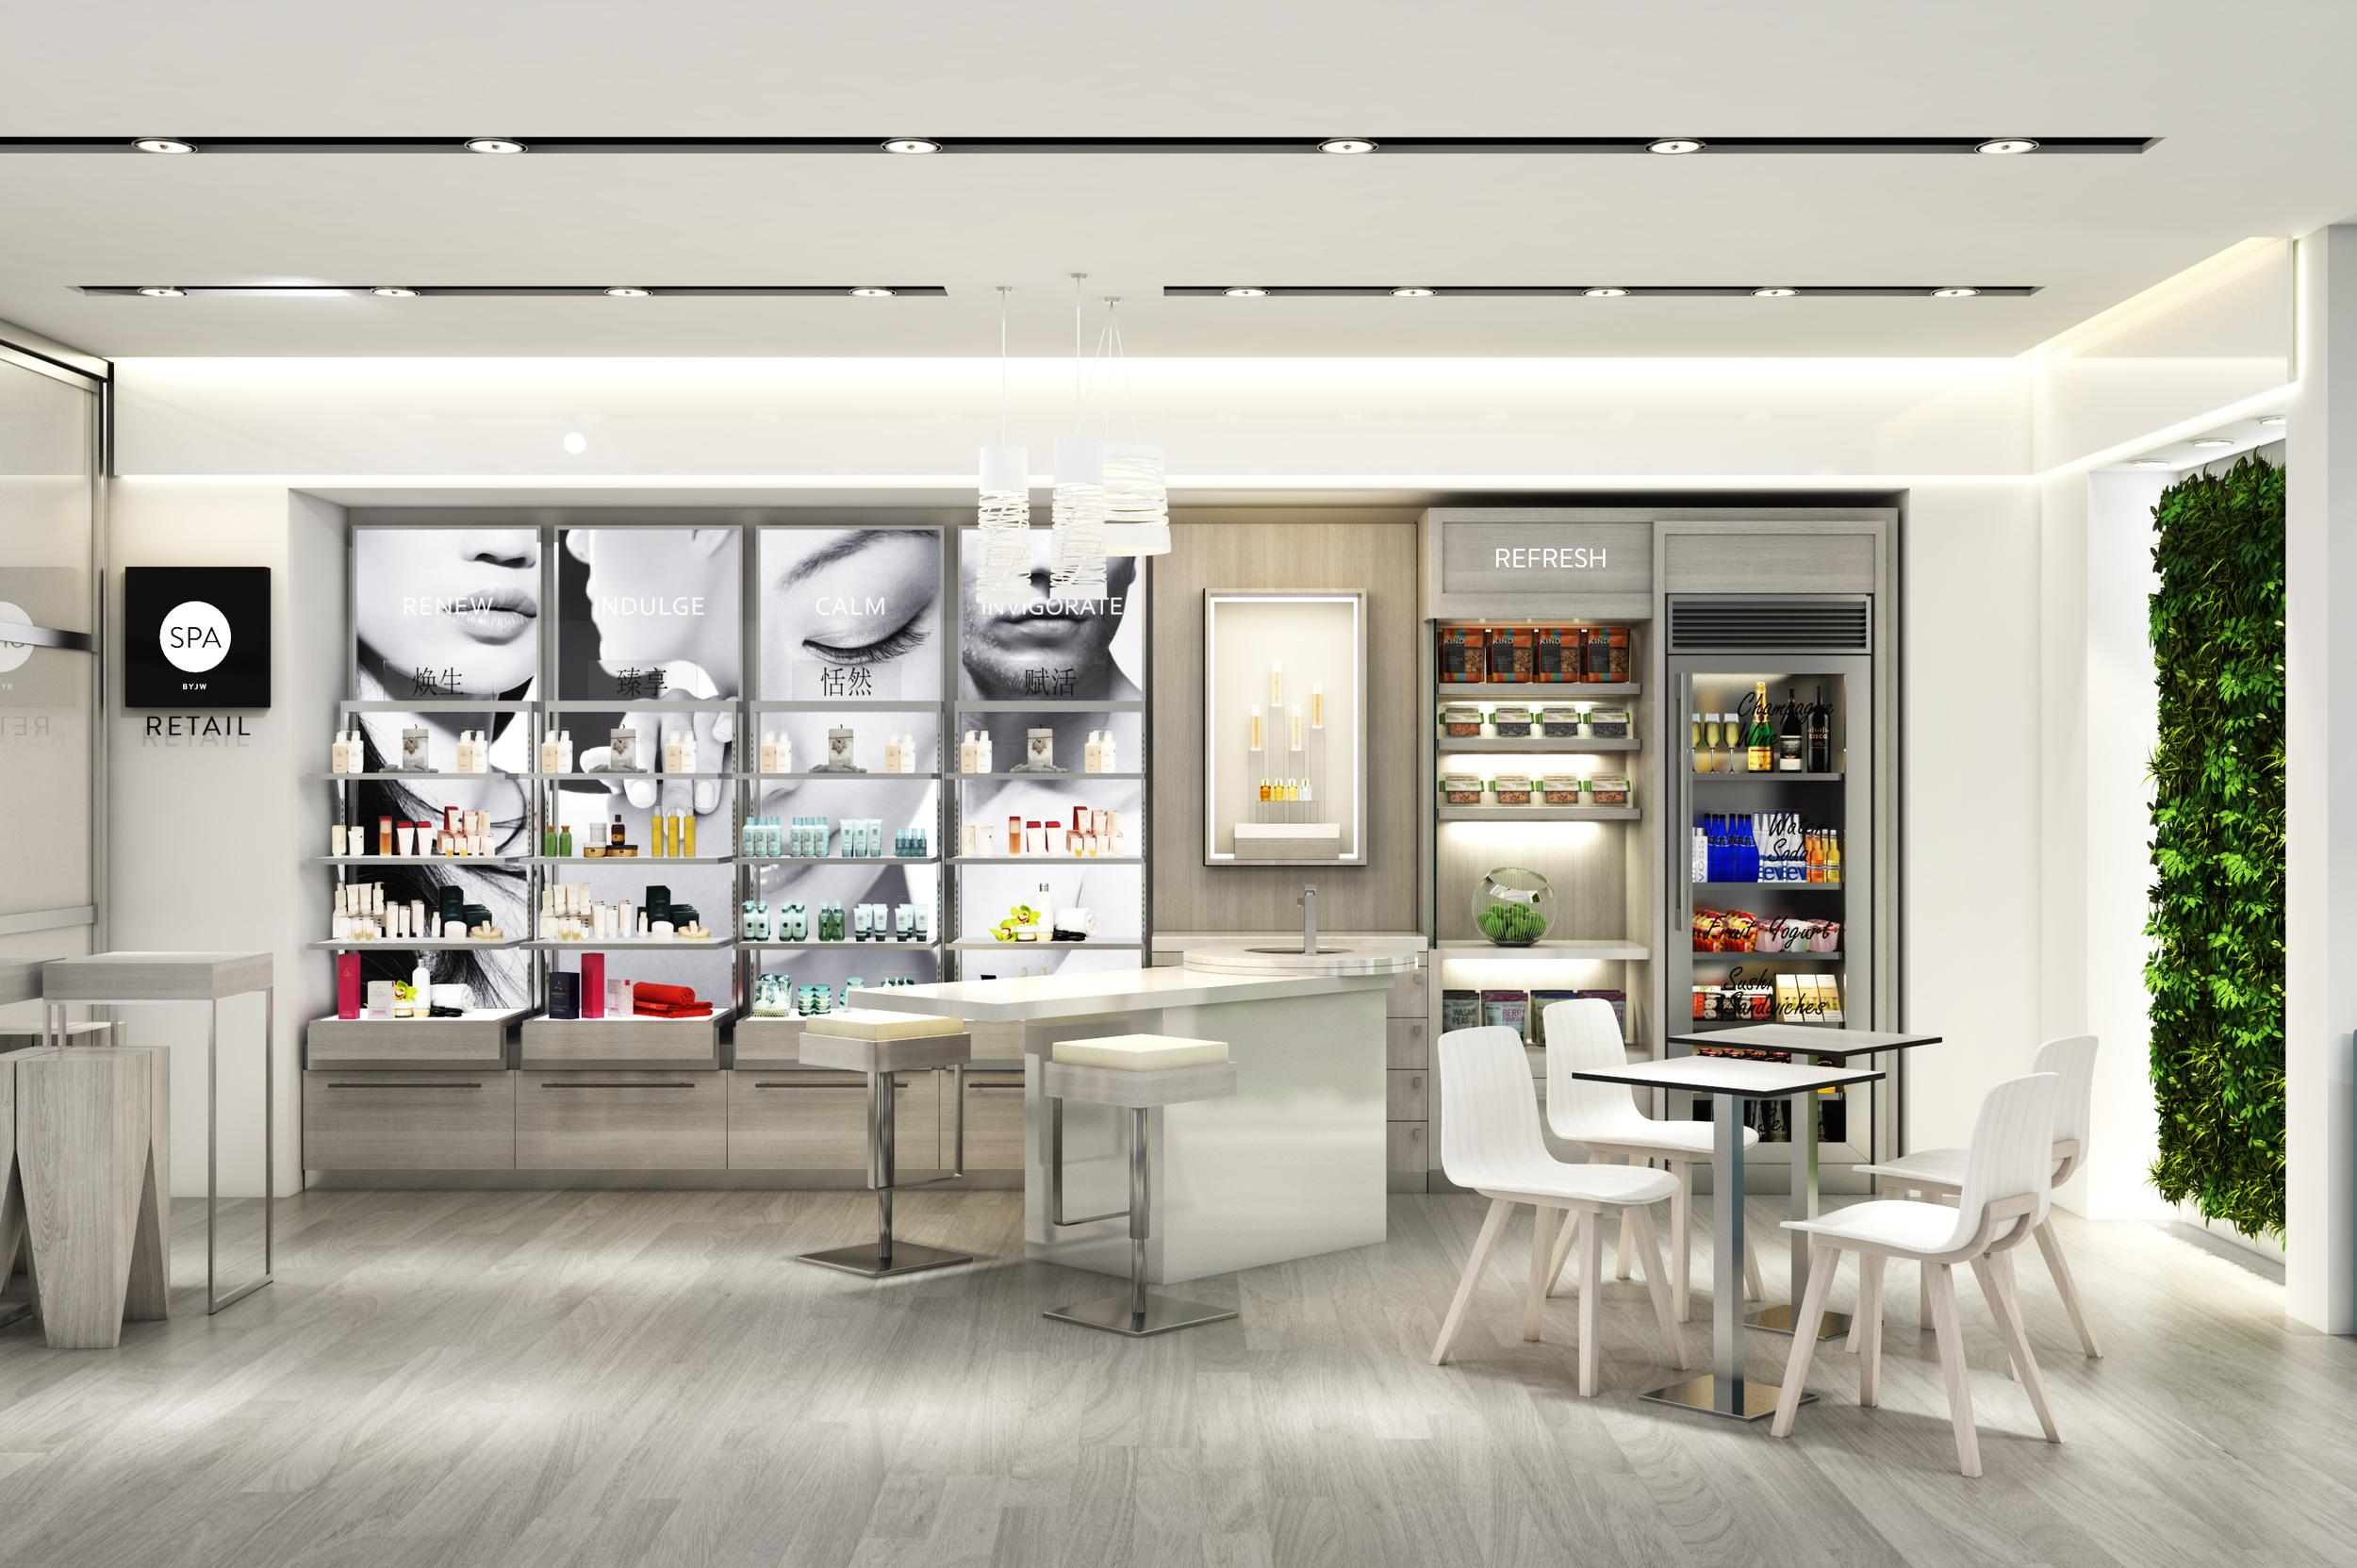 Spa Retail 1.jpg